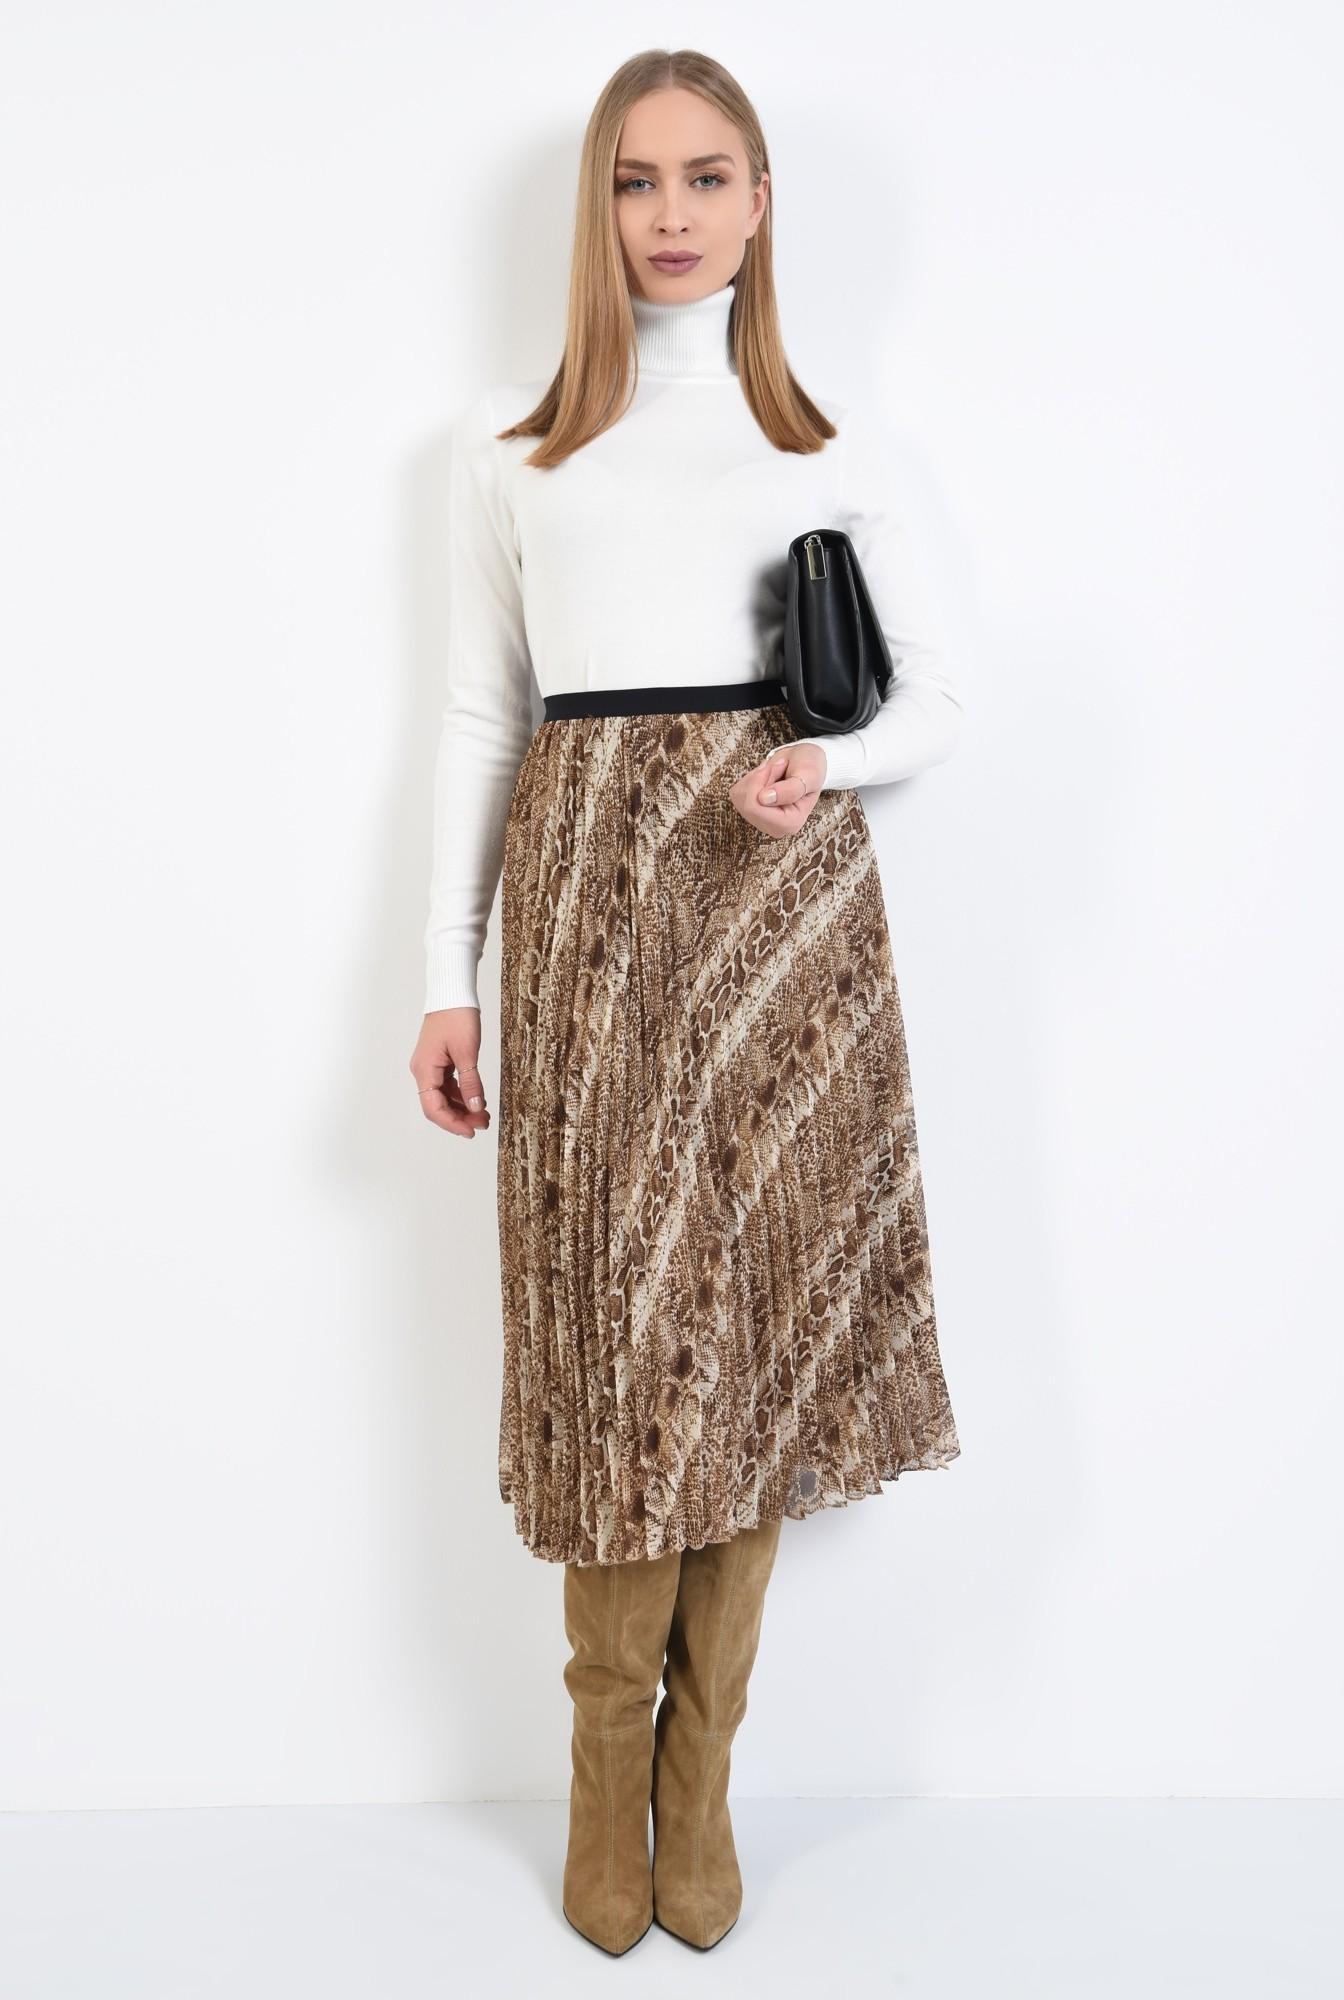 3 - pulover tip maleta, alb, borduri reiate, guler inalt, bluza tricotata